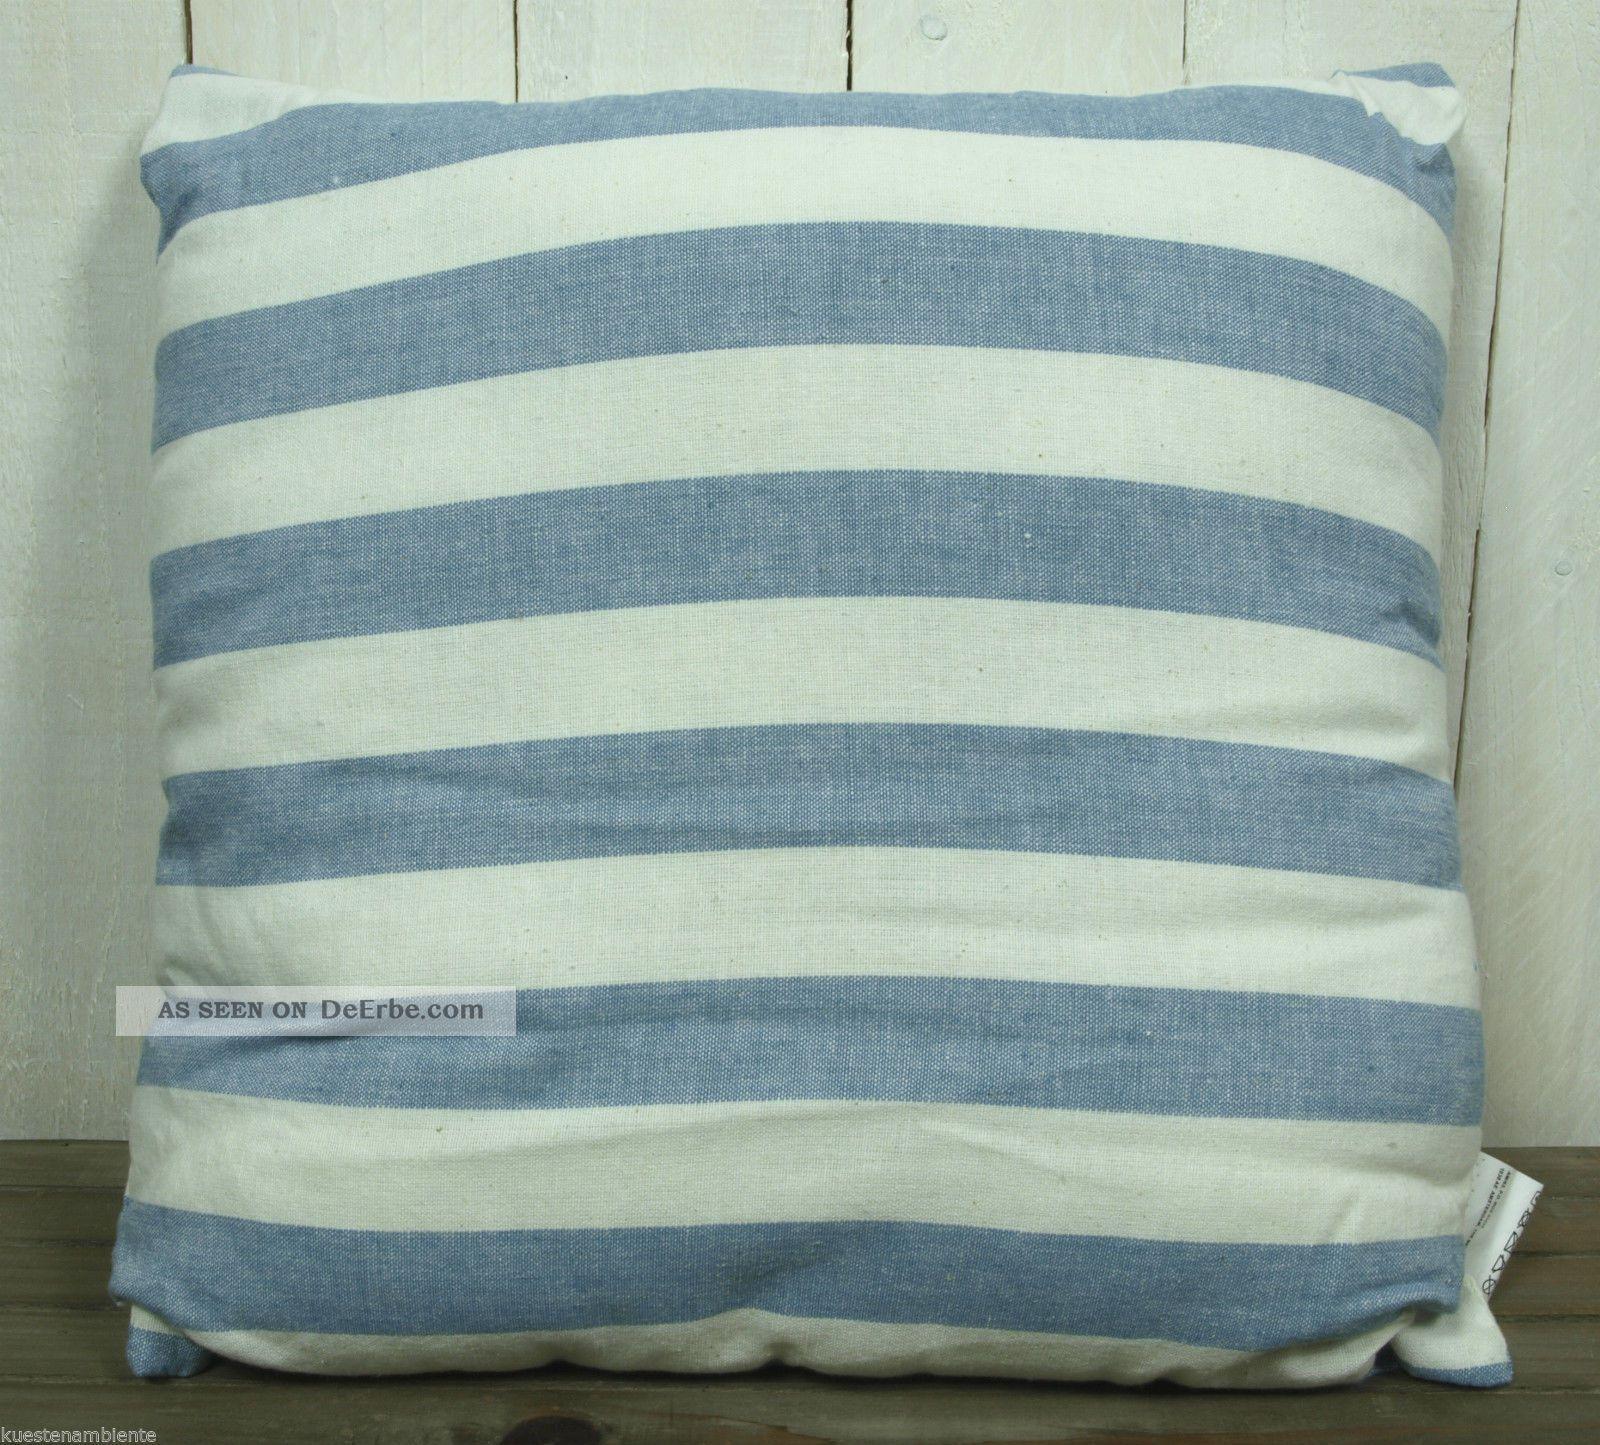 maritimes deko kissen sofakissen mit f llung 40x40 cm blau natur gestreift. Black Bedroom Furniture Sets. Home Design Ideas